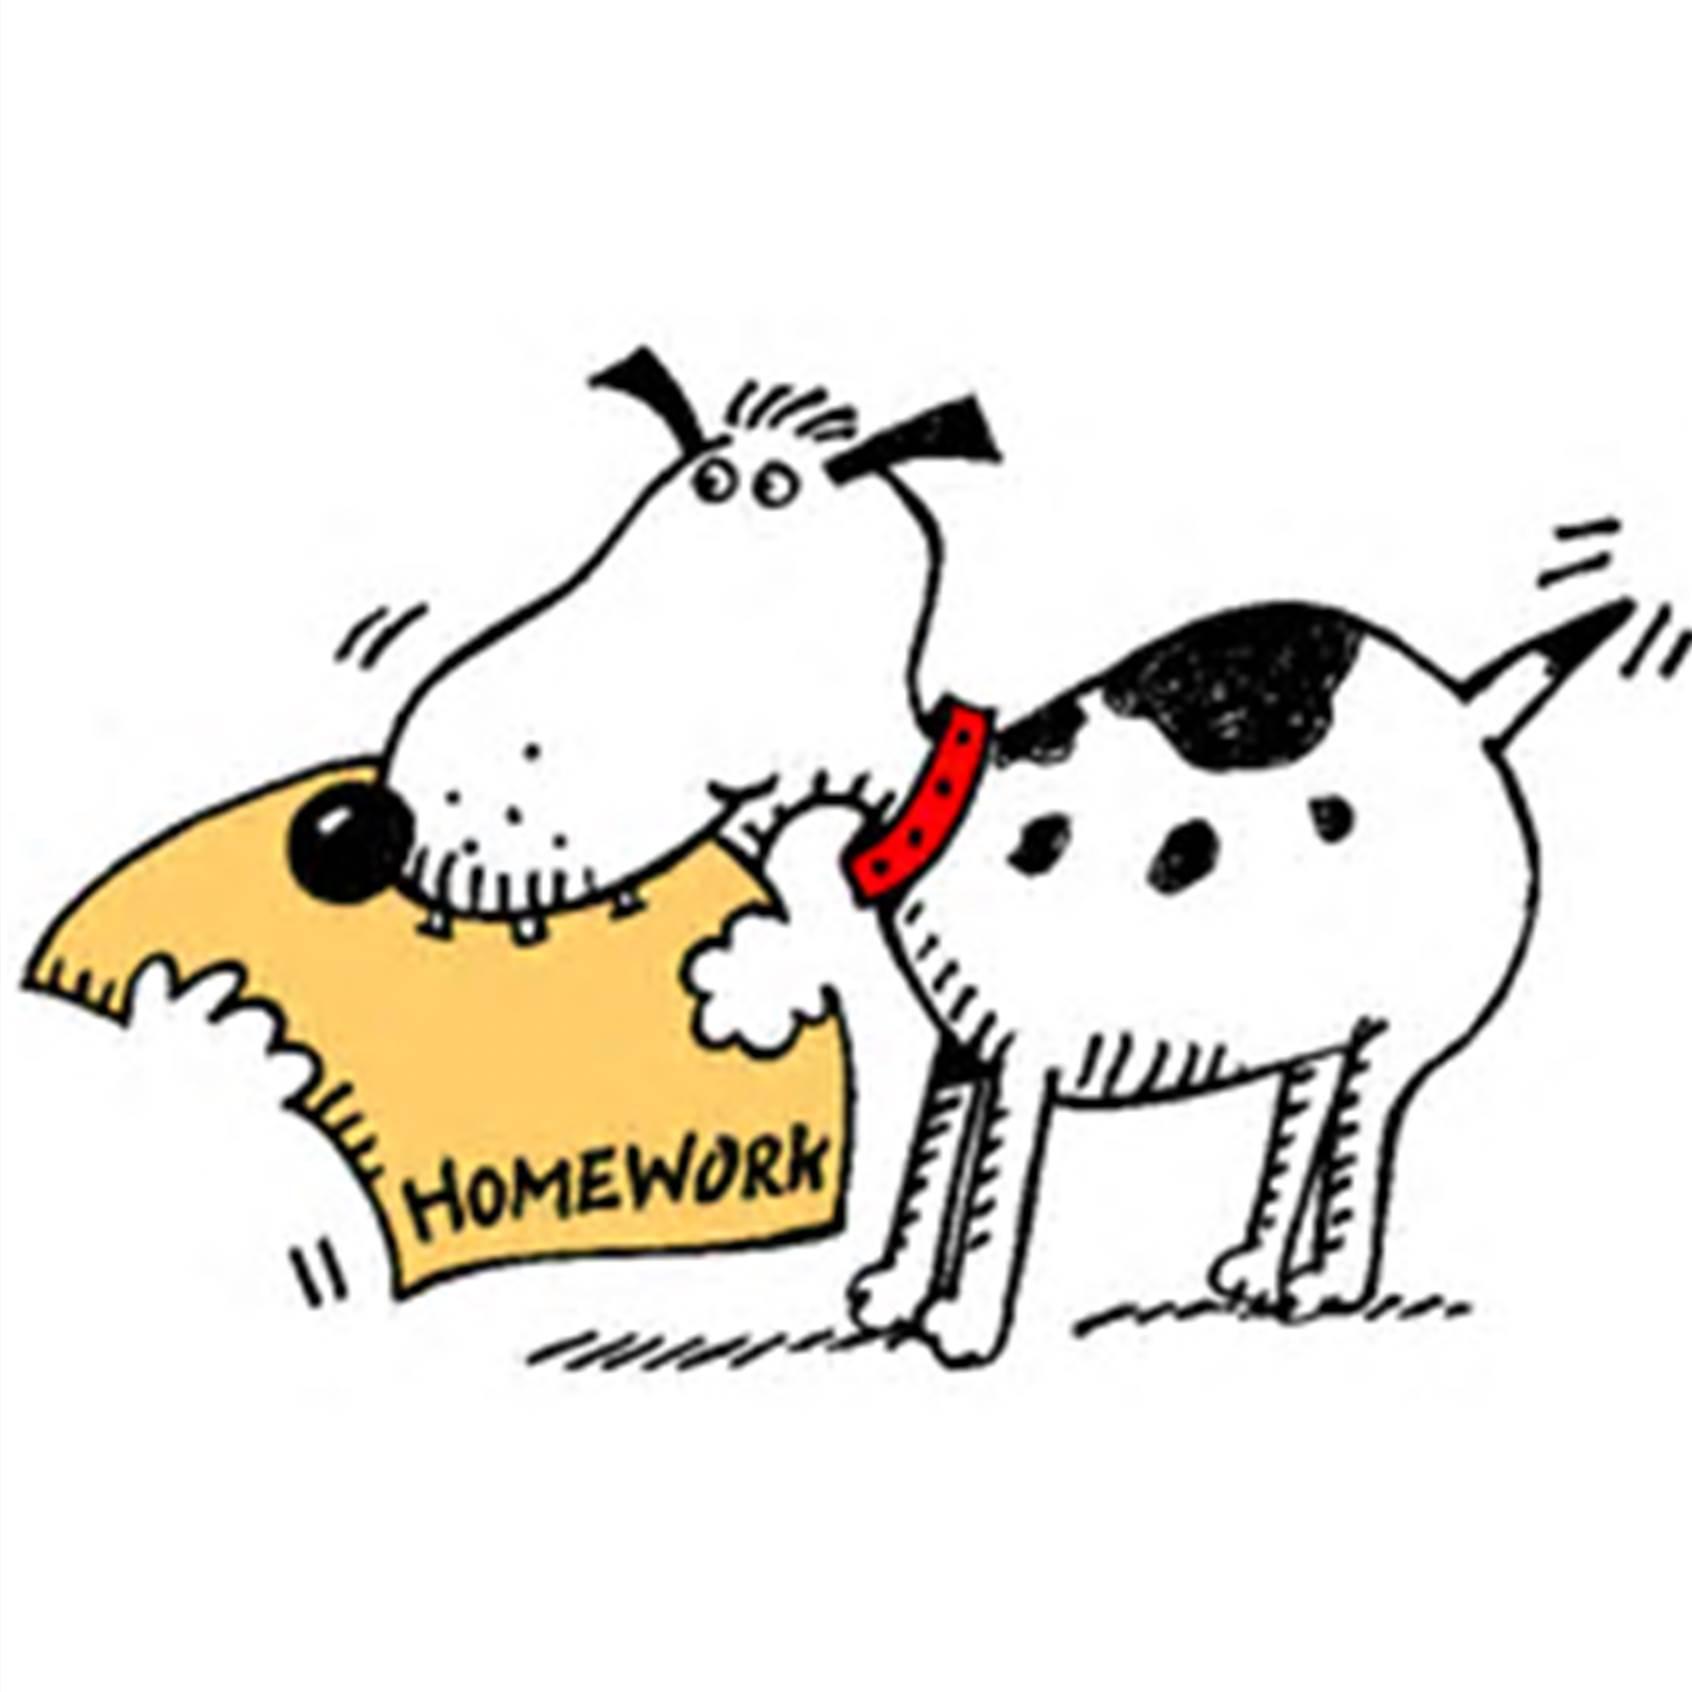 Homework clipart Eu Dog art of homework